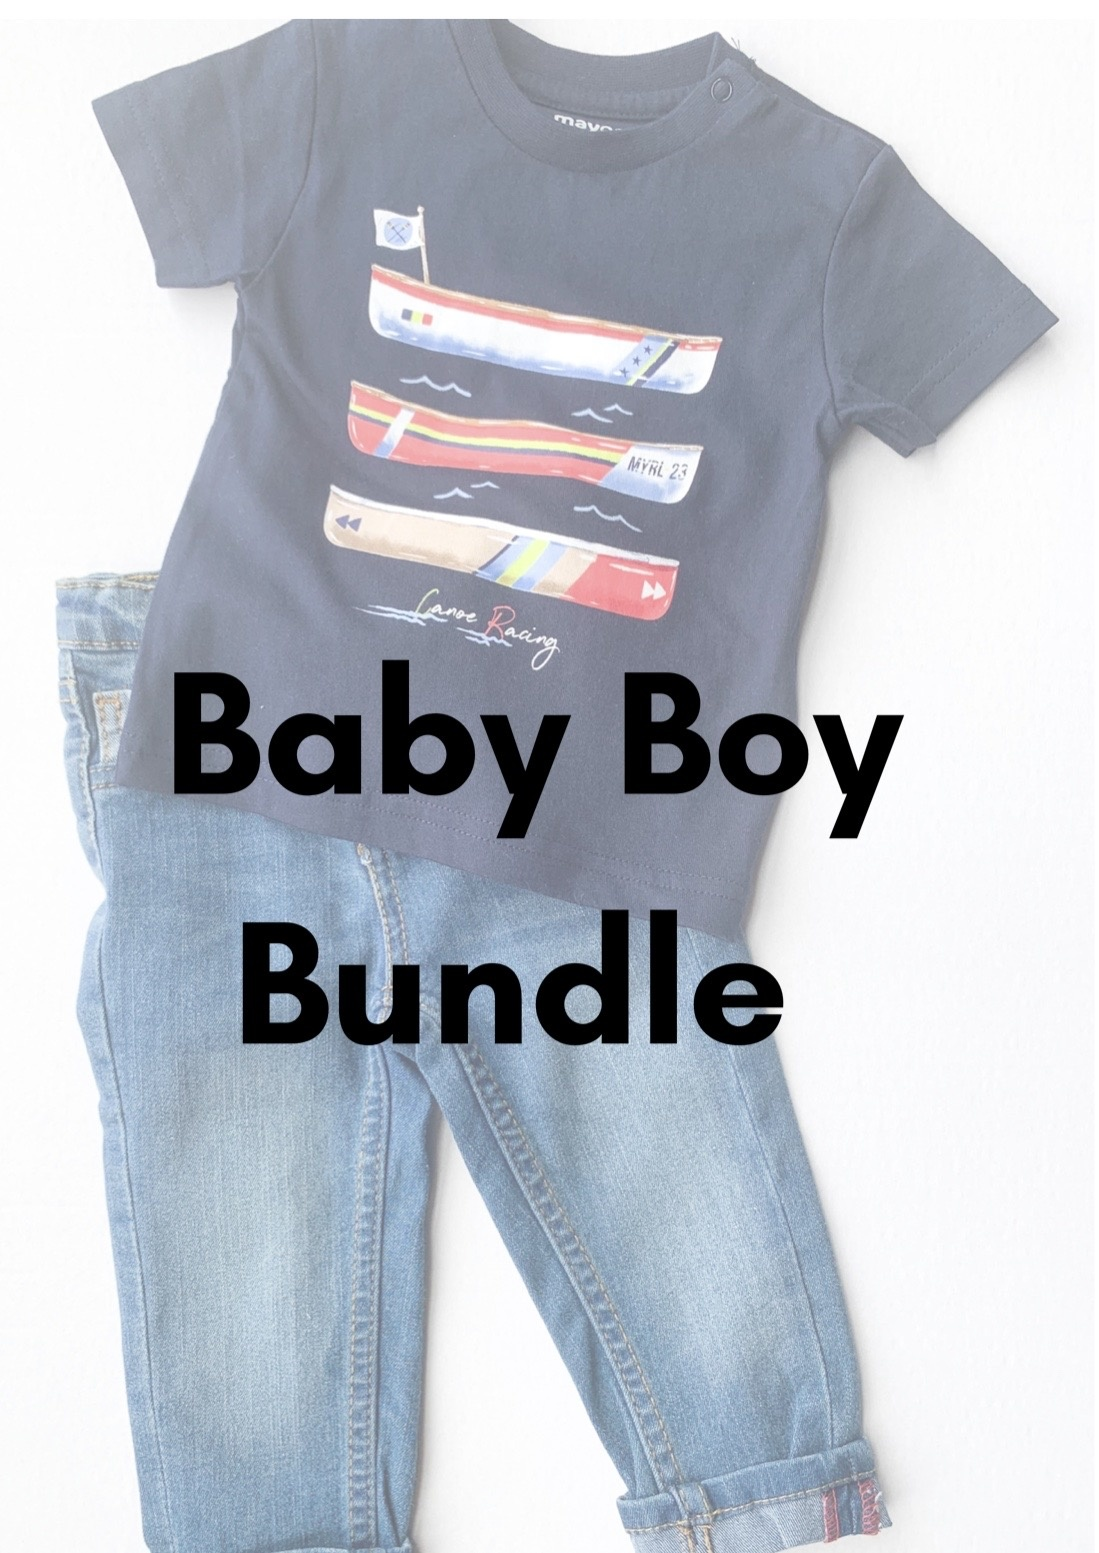 Mystery Clothing Bundle - Baby Boy